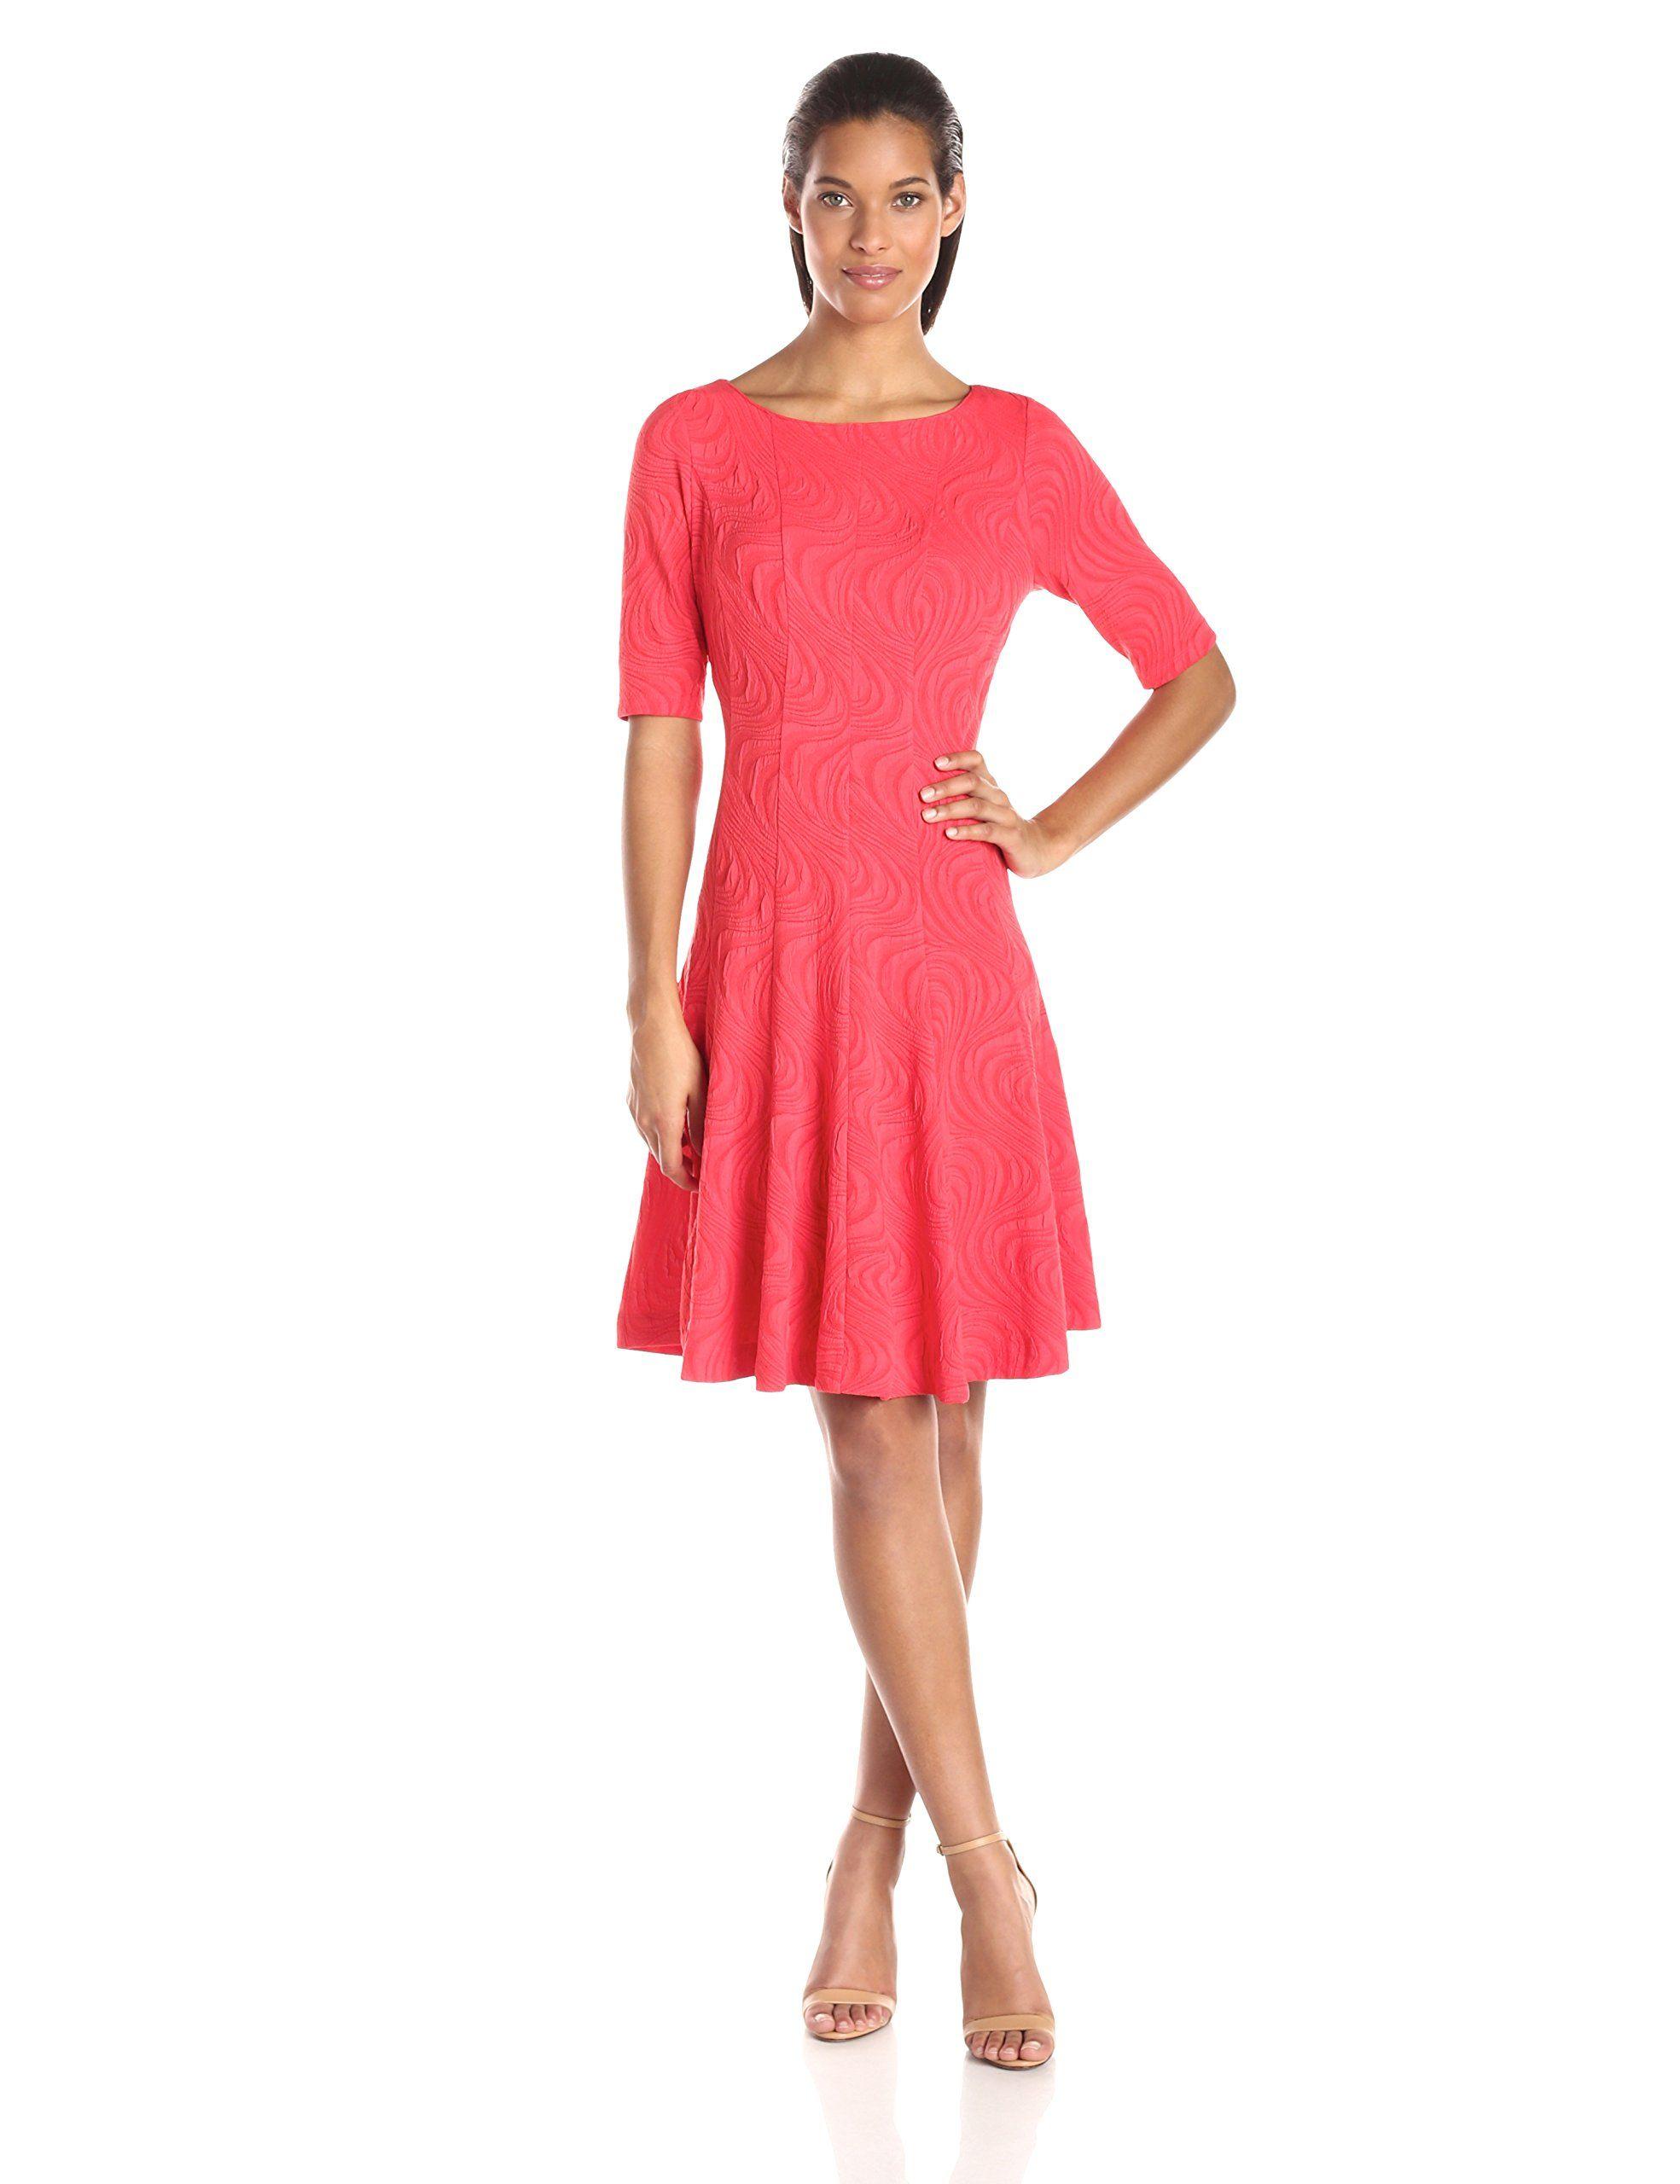 b0748d9f6169 Julian Taylor Women's Short-Sleeve Flare Dress at Amazon Women's Clothing  store: